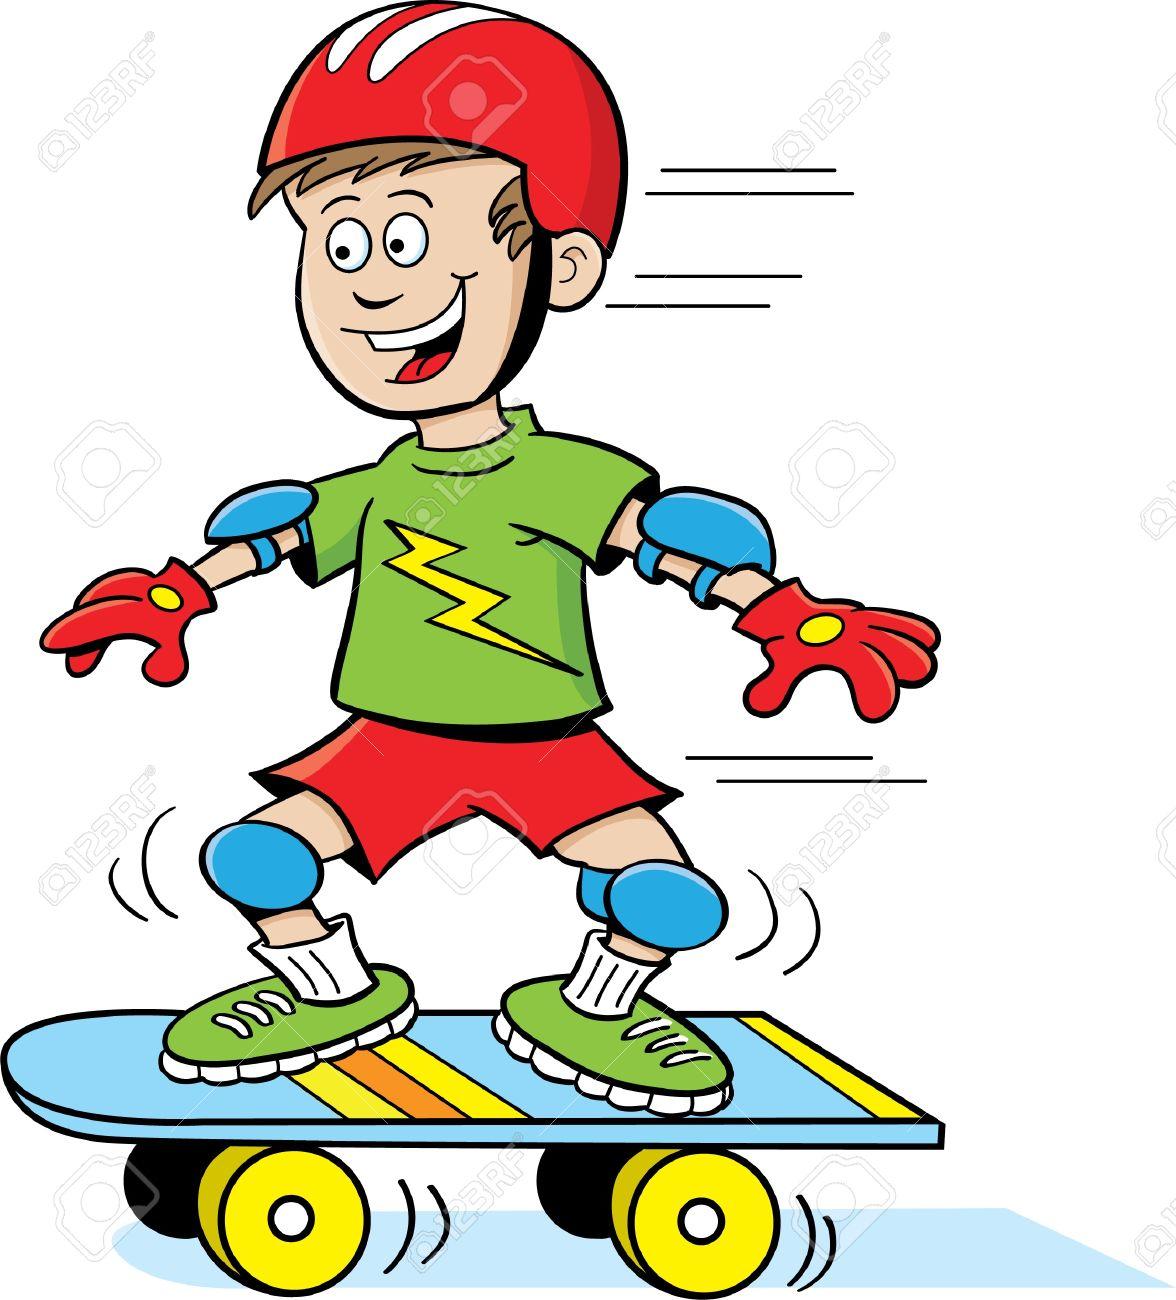 skateboard clipart 3